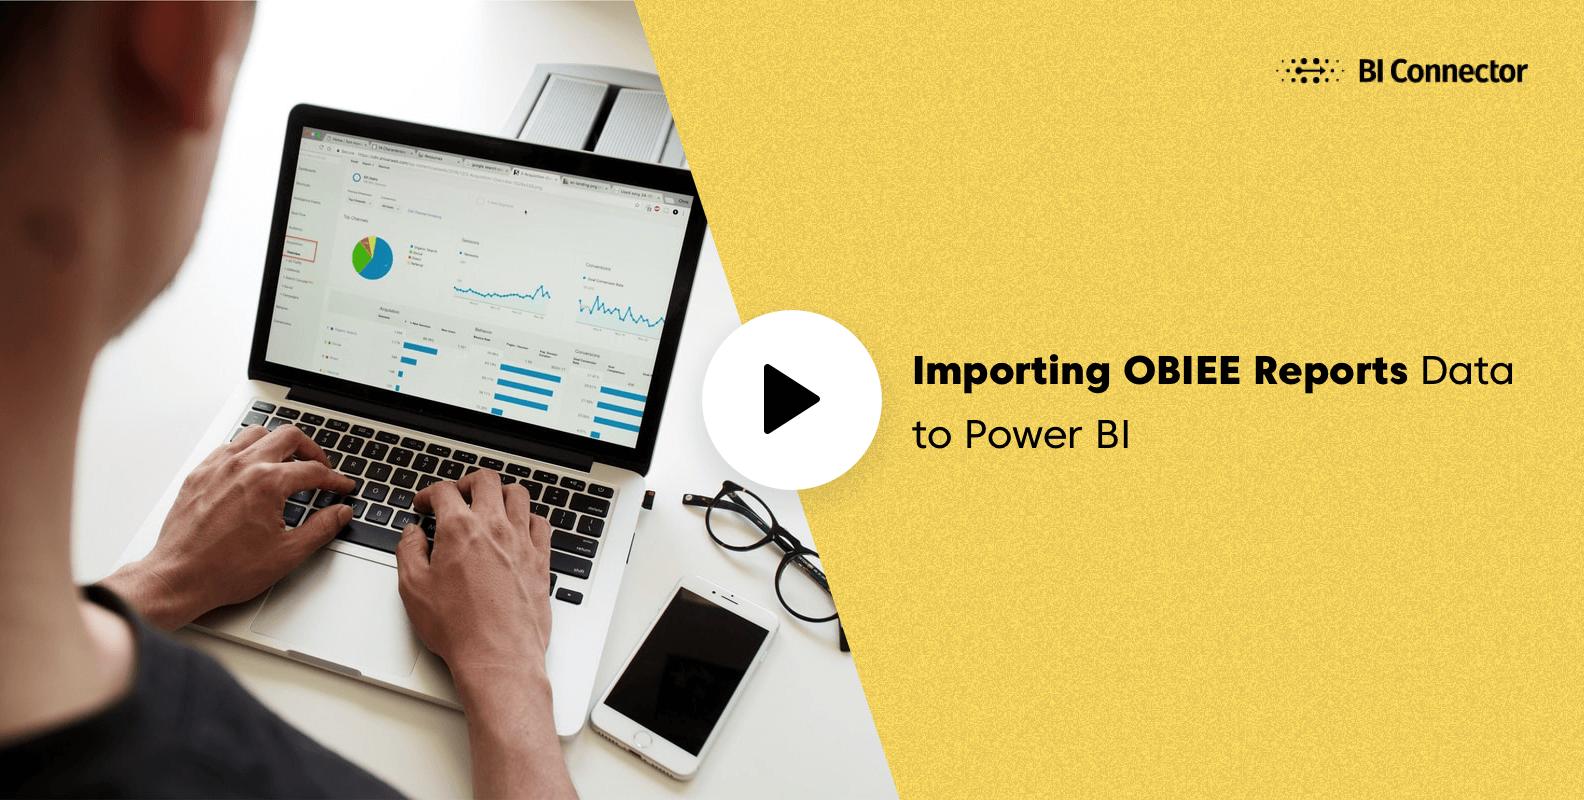 Importing OBIEE Reports Data to Power BI